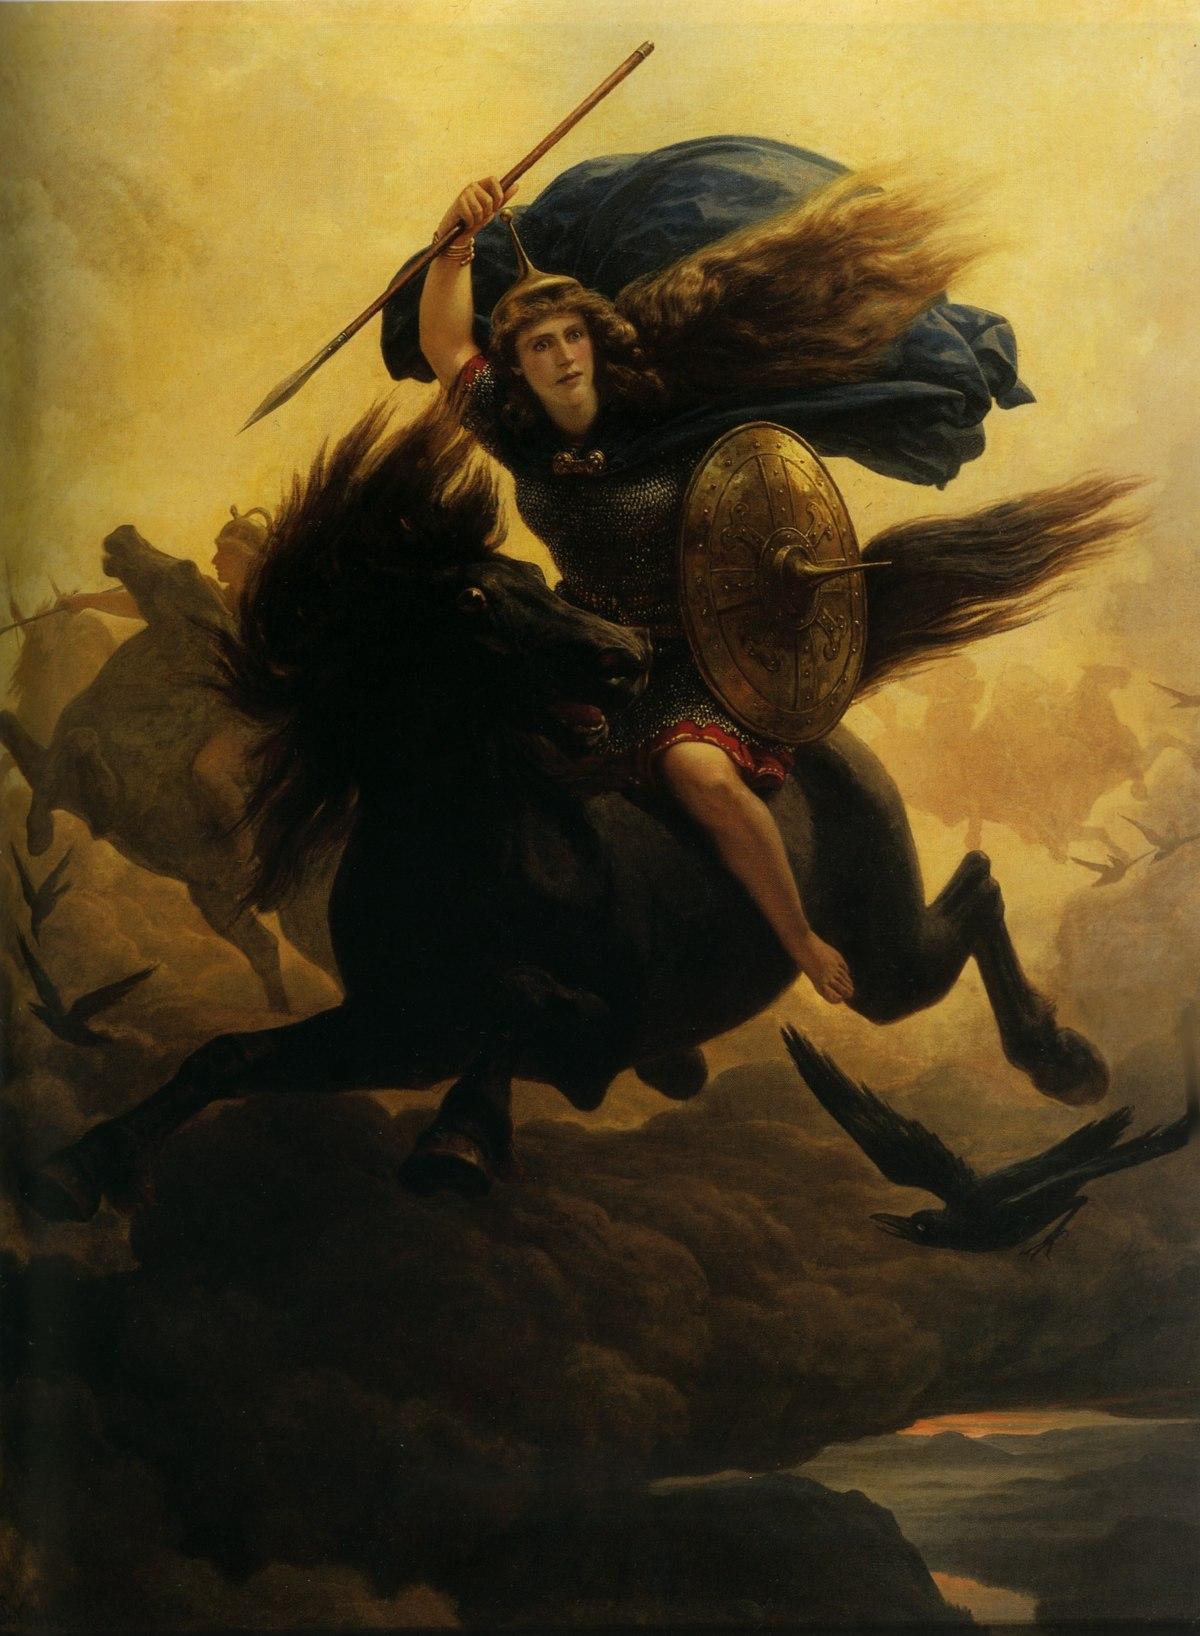 Knight Carrying Princess